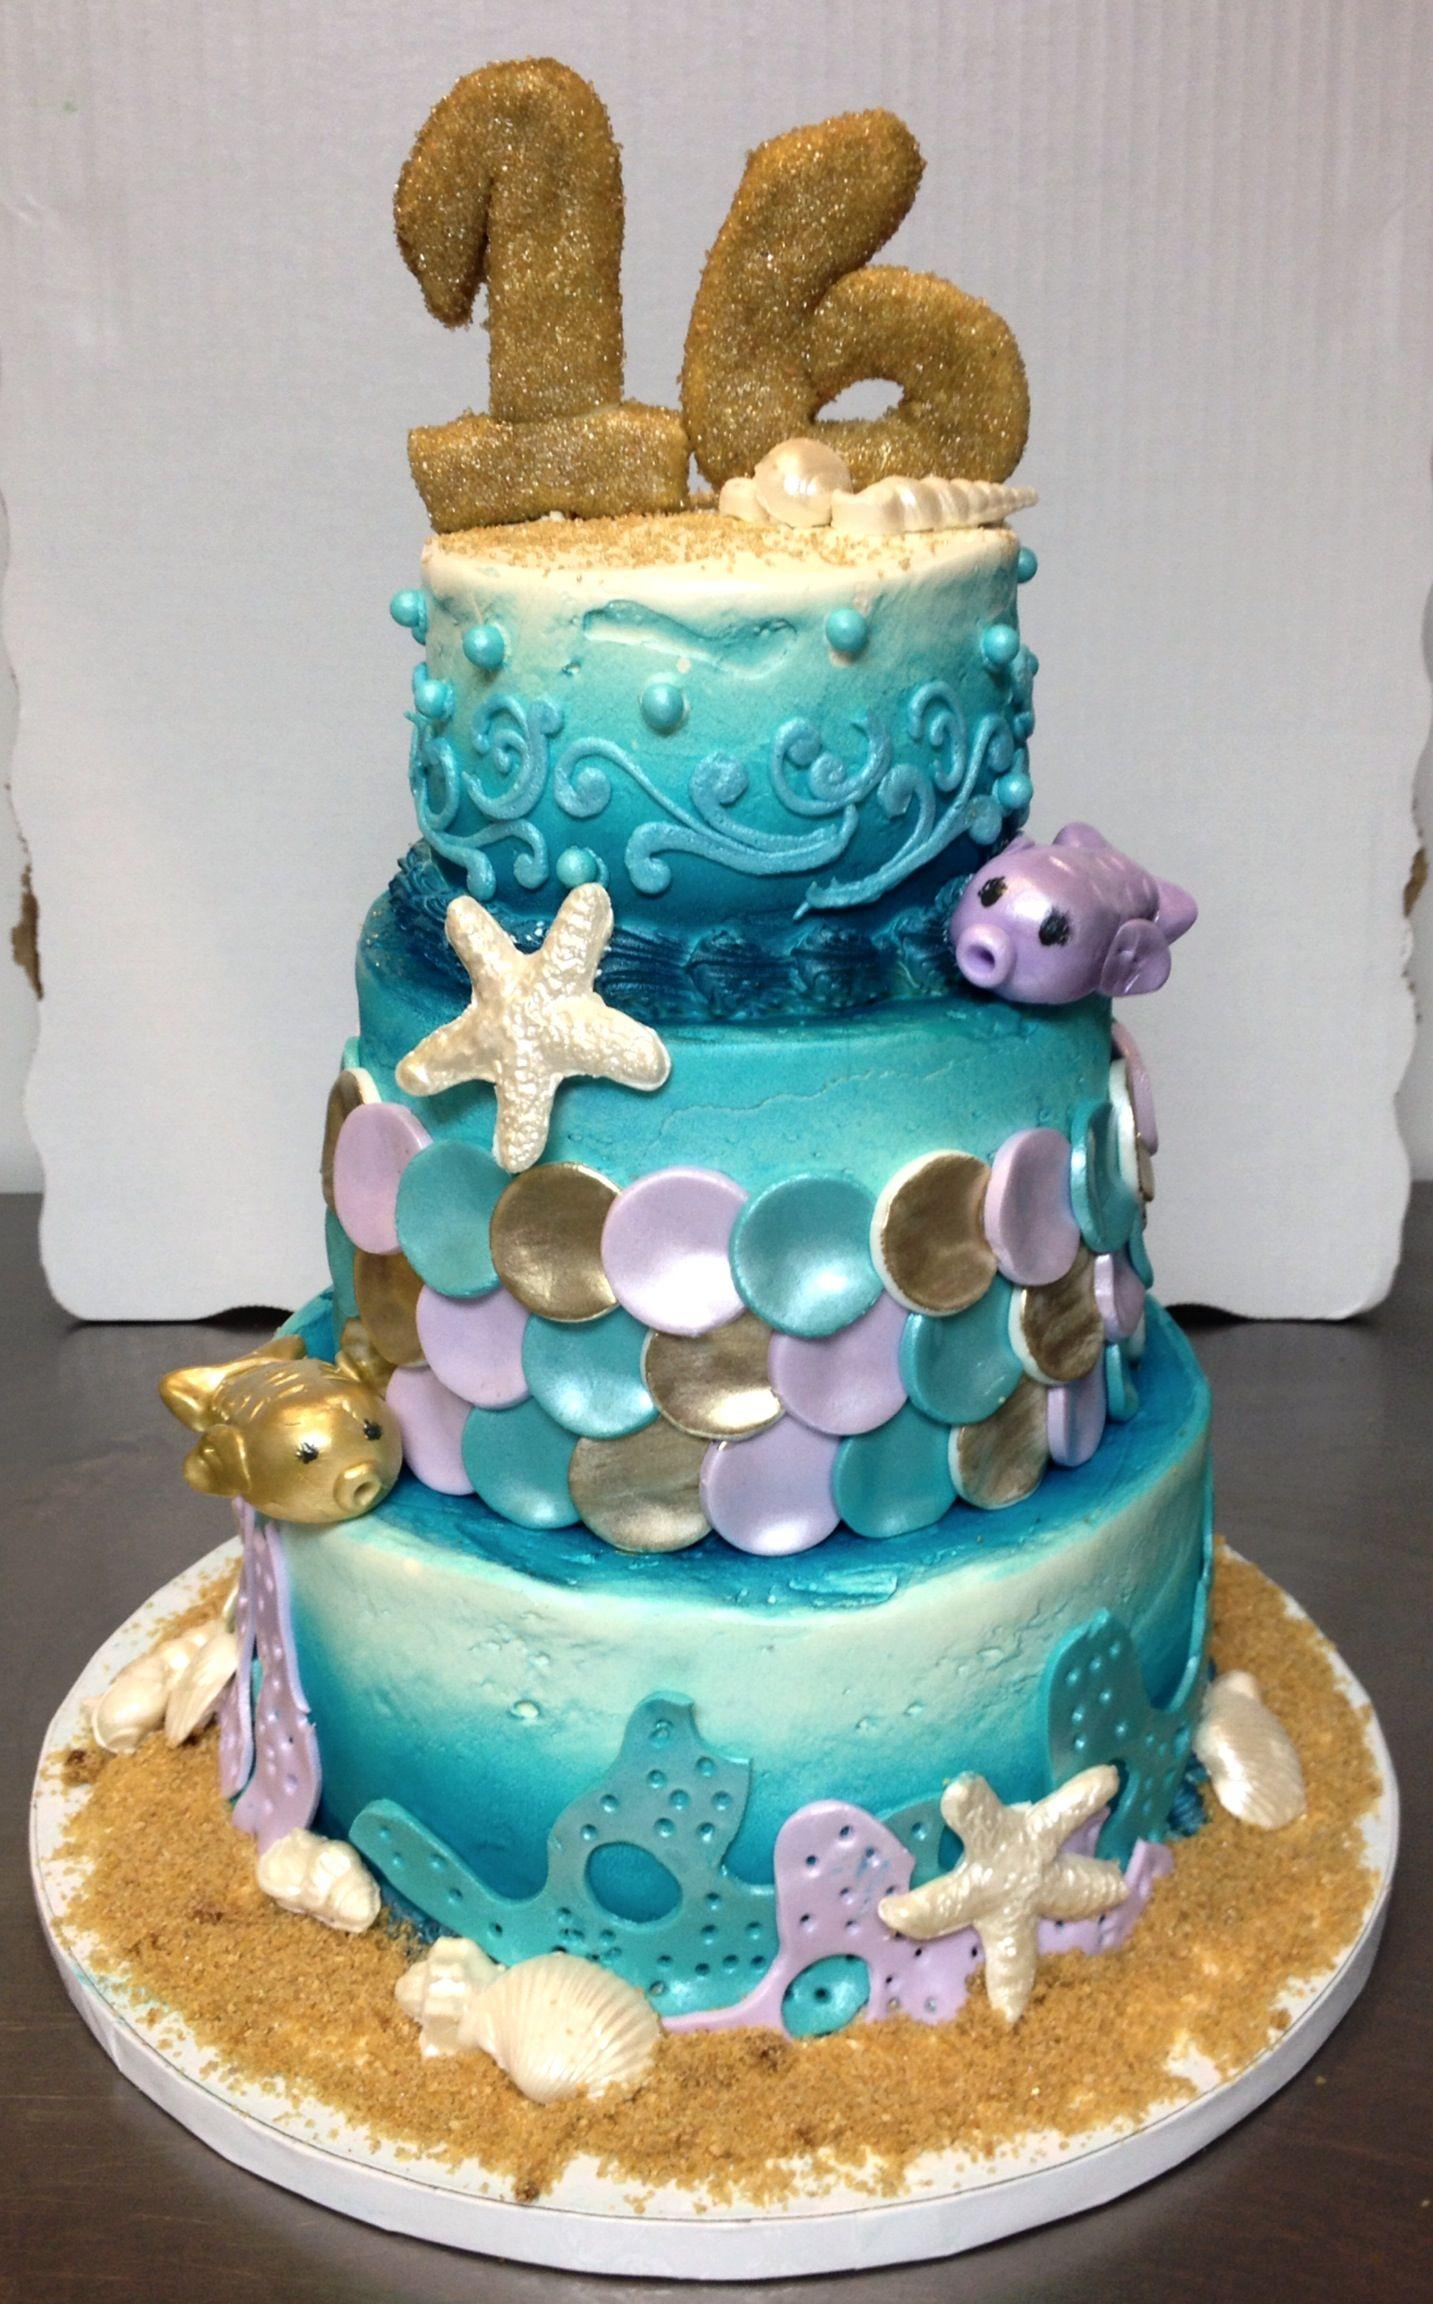 Colored Princess Sea Shells To Decorate A Cake